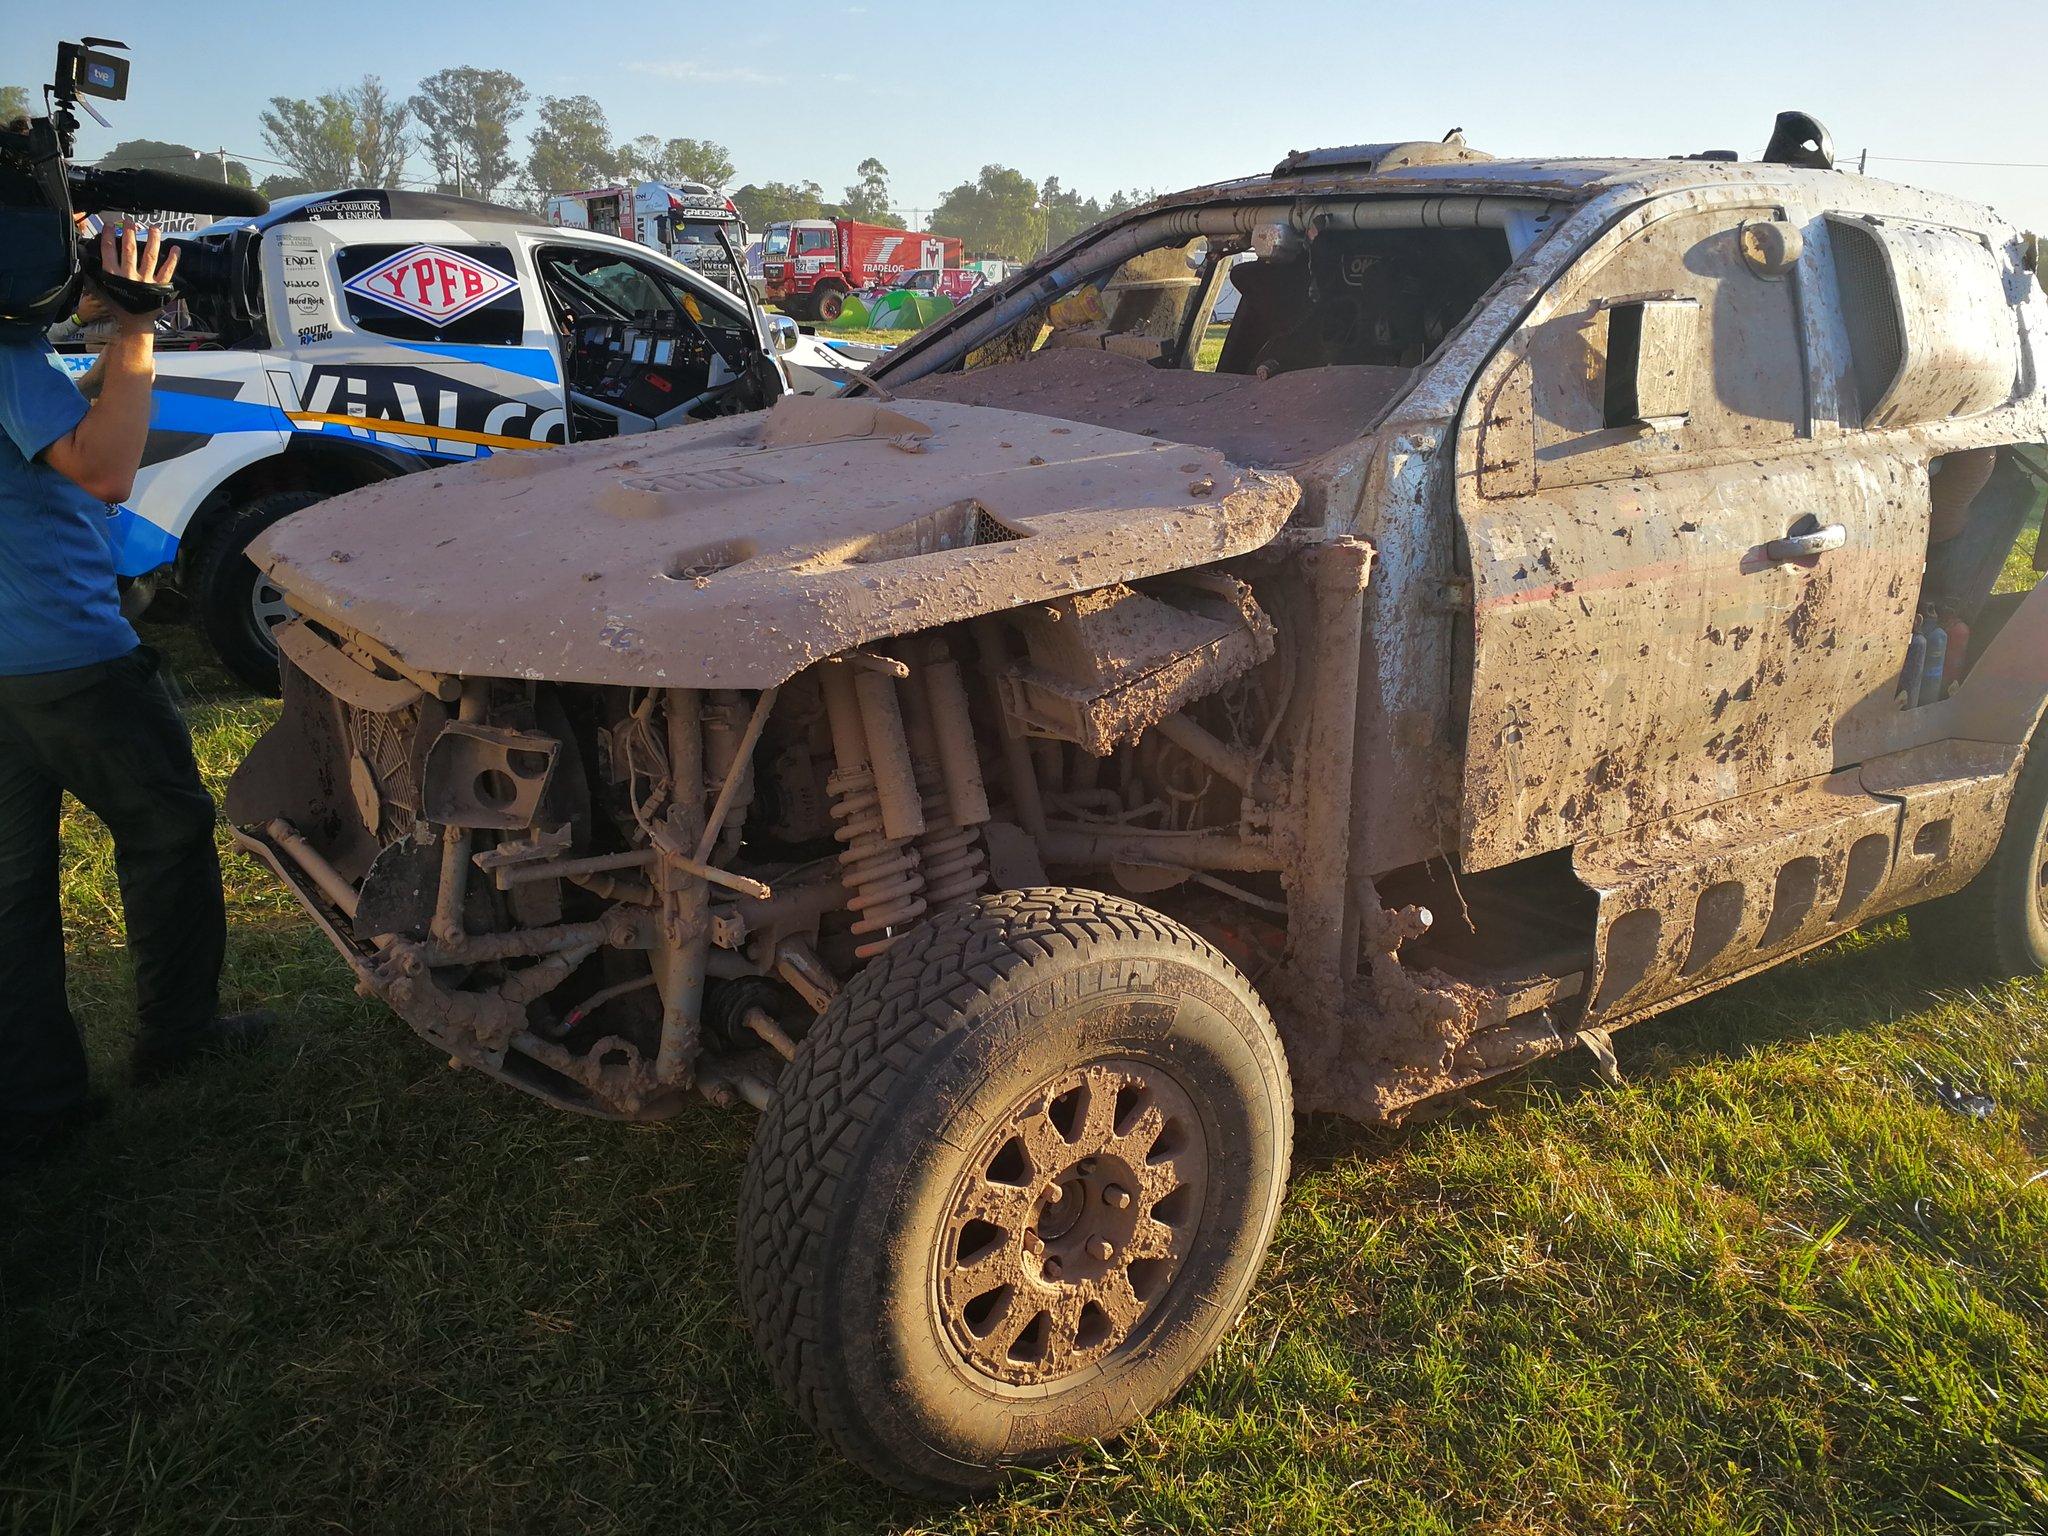 2017 Rallye Raid Dakar Paraguay - Bolivia - Argentina [2-14 Enero] - Página 19 C1UdpchXgAA8_Ud